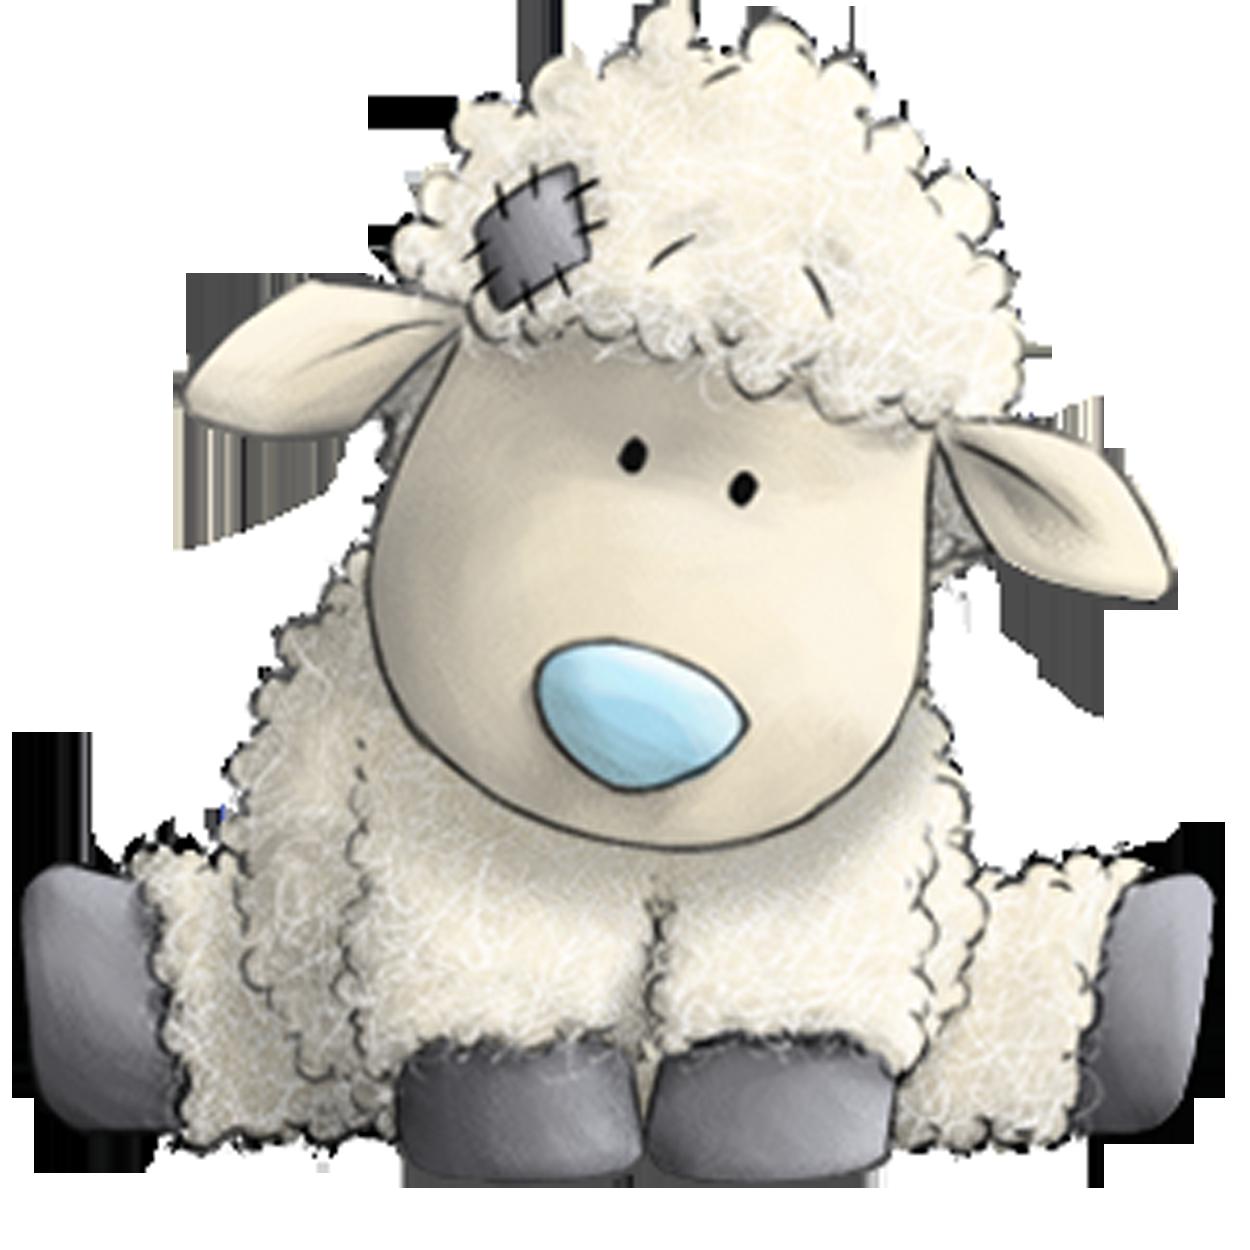 imagenes png fondo transparente photoscape | new | Pinterest for Baby Lamb Clipart  55nar